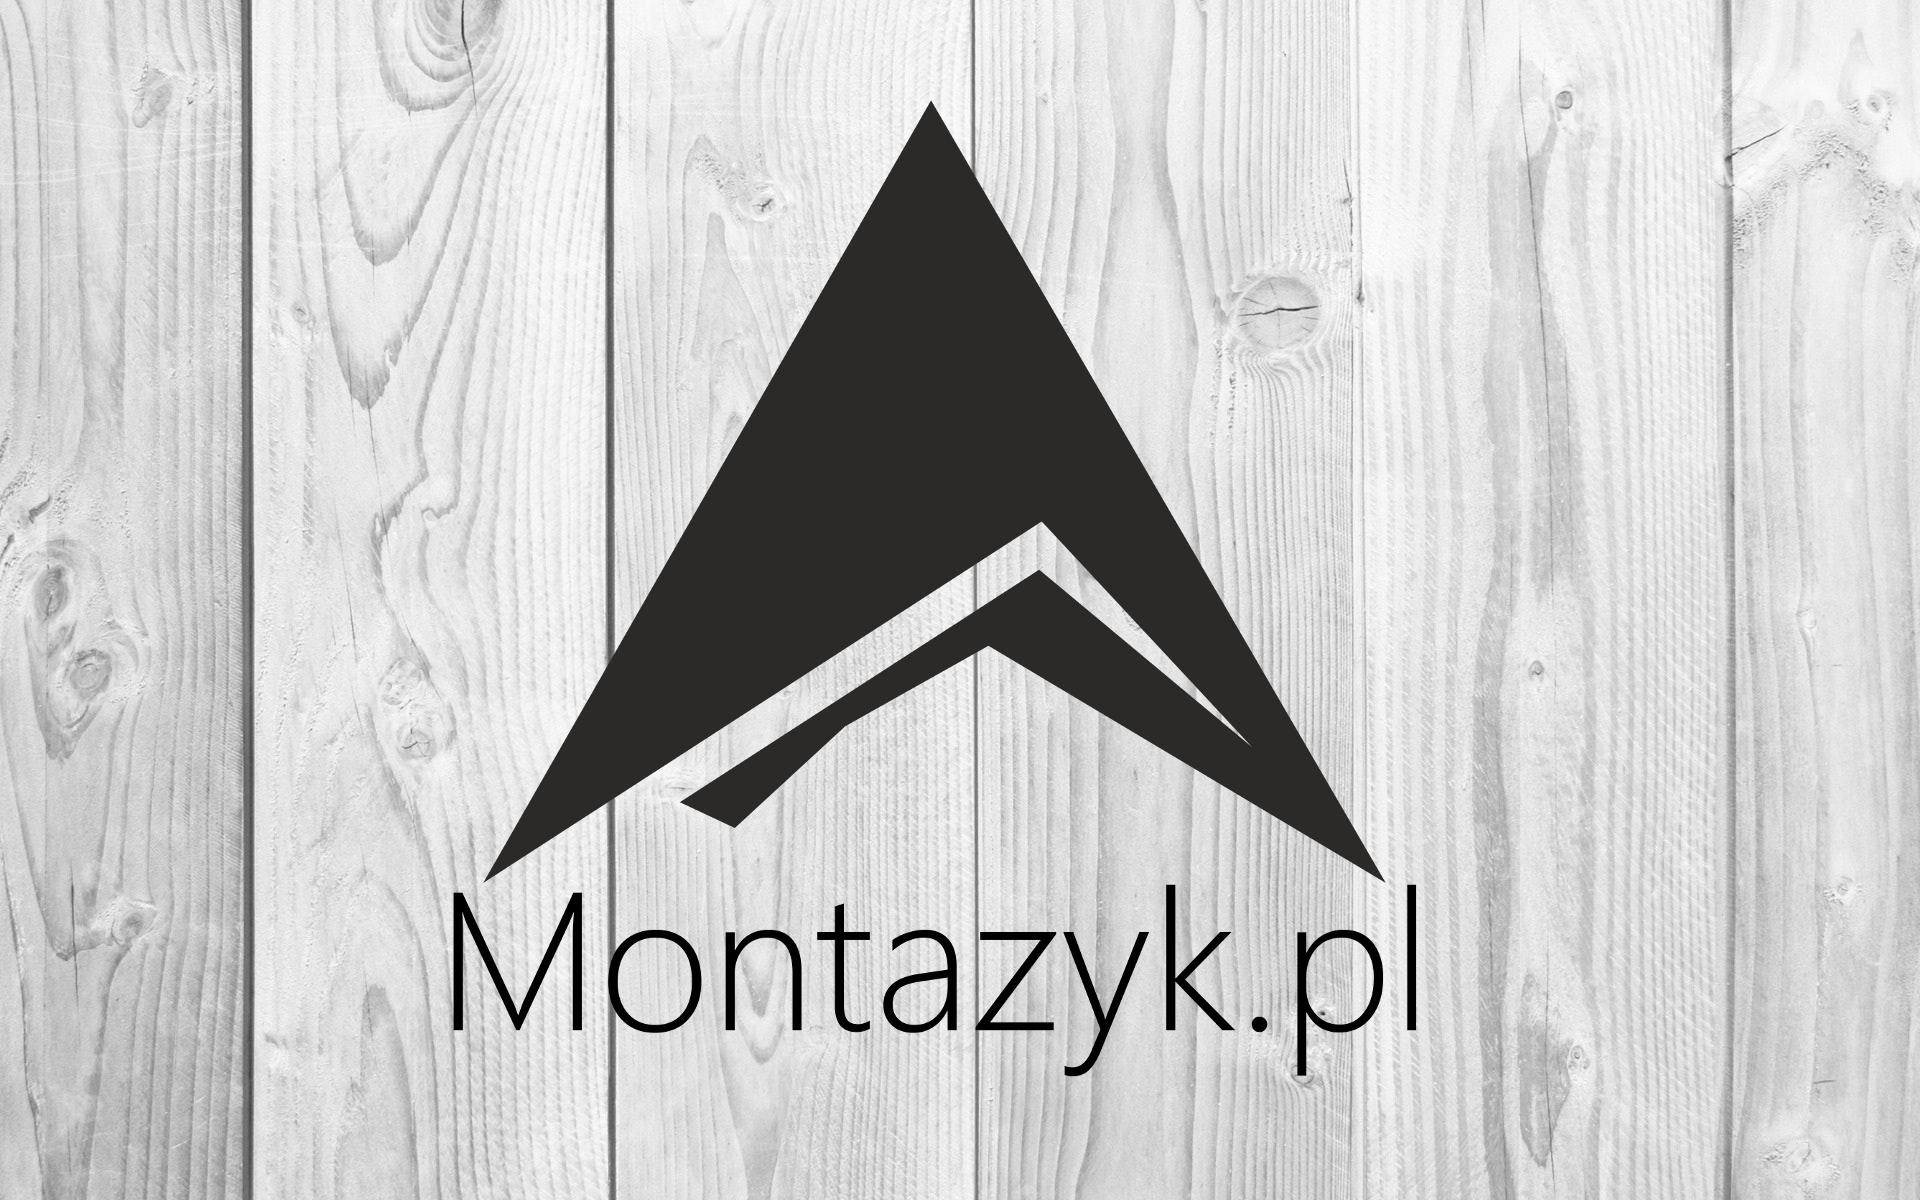 montazyk.pl